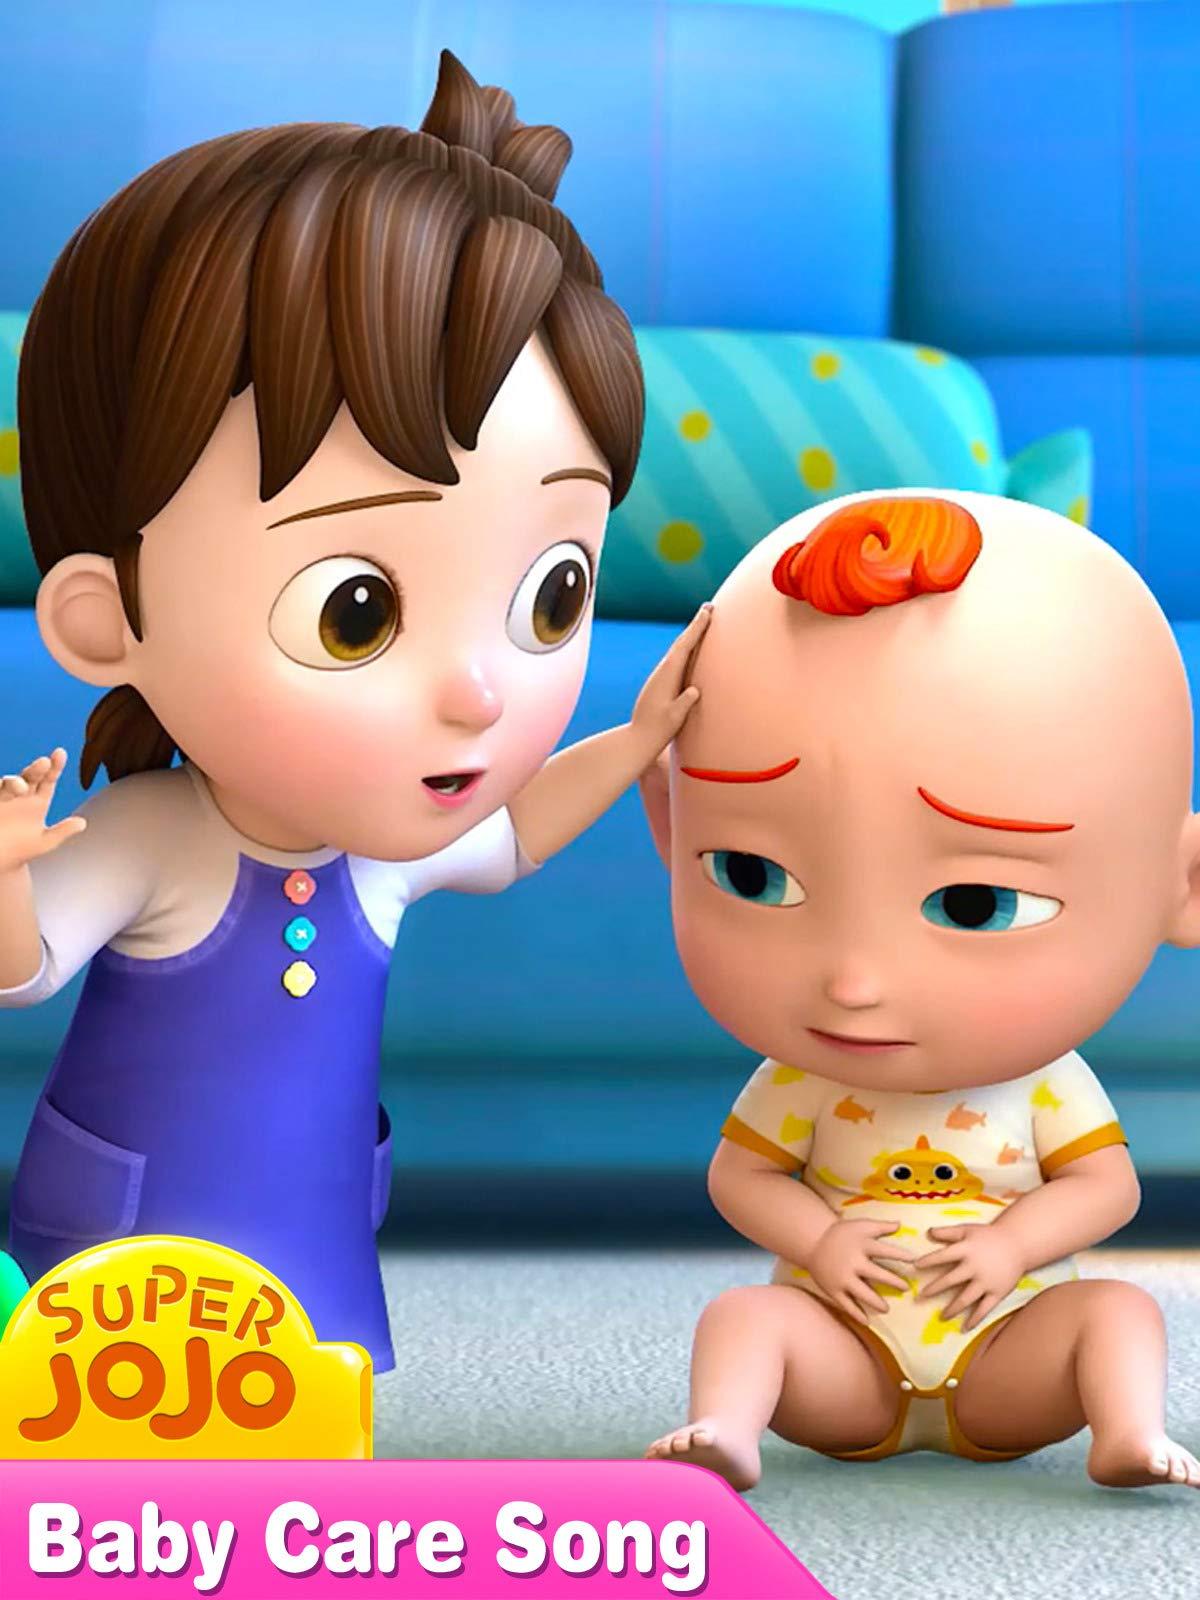 Super JoJo - Baby Care Song